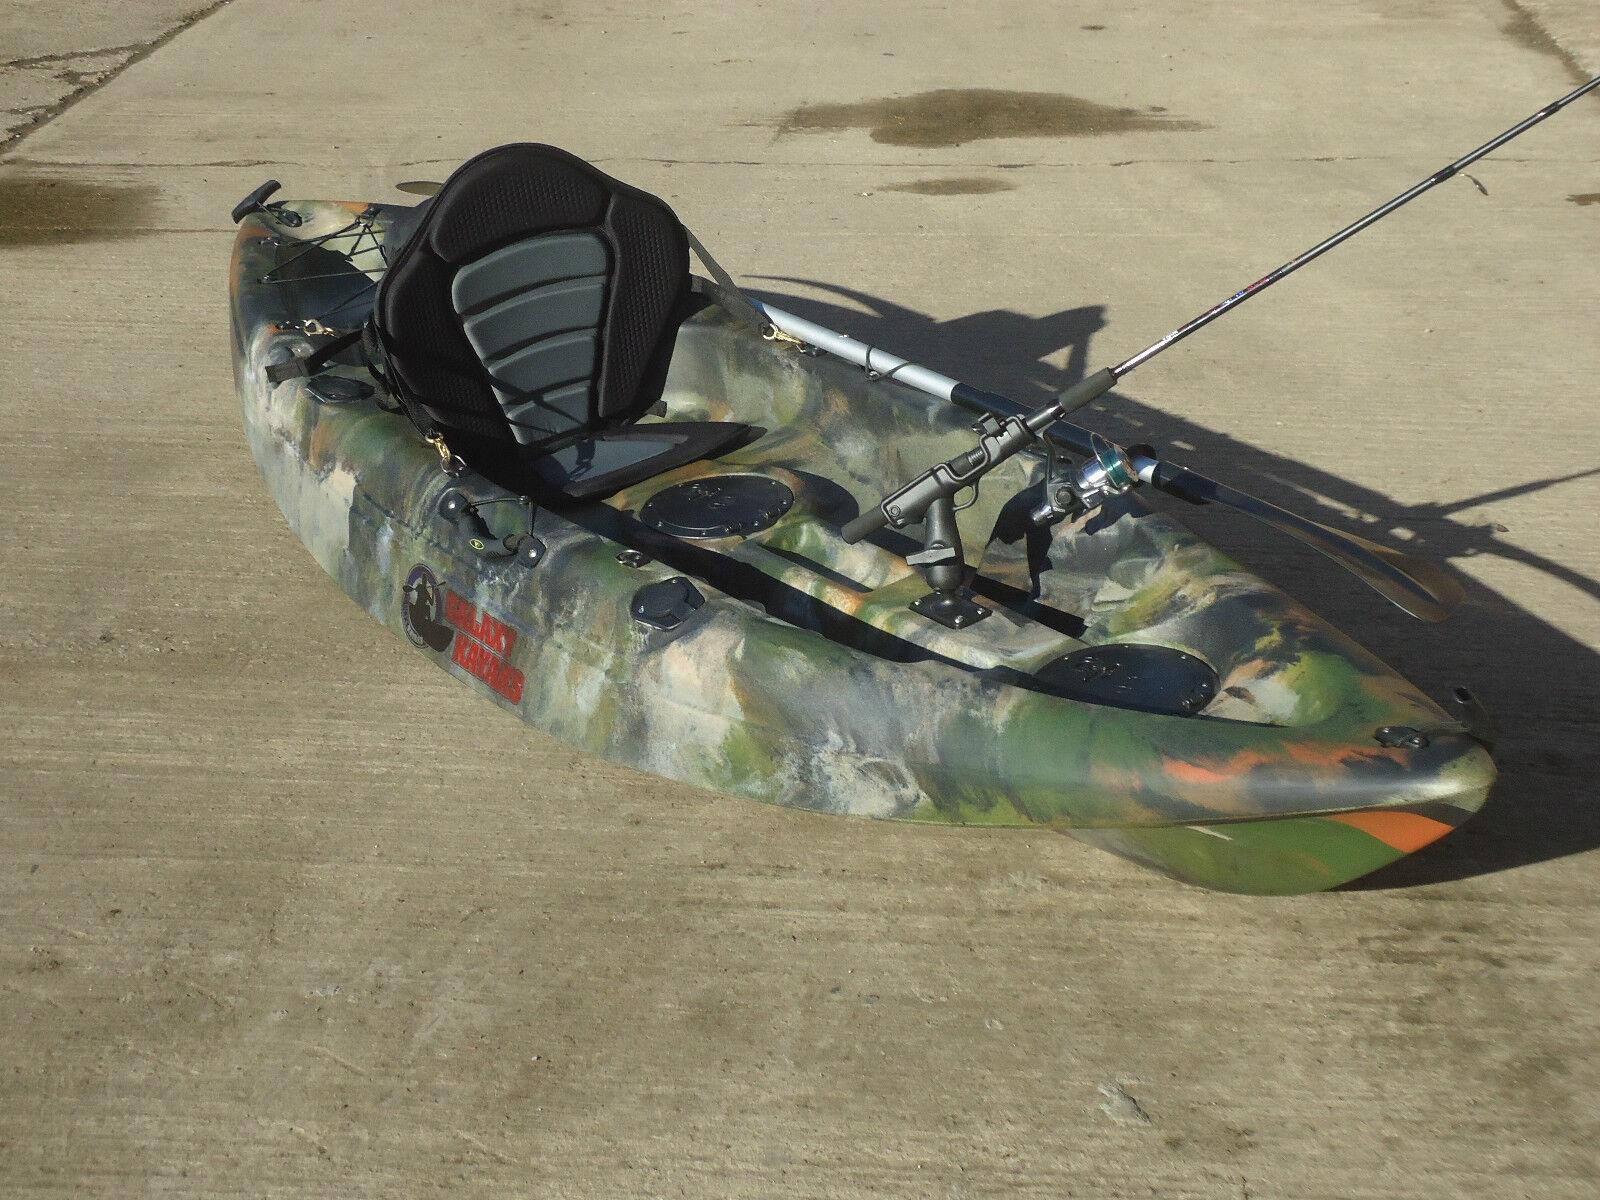 Sit on top fishing kayak galaxy cruz new model with free for Best sit in fishing kayak